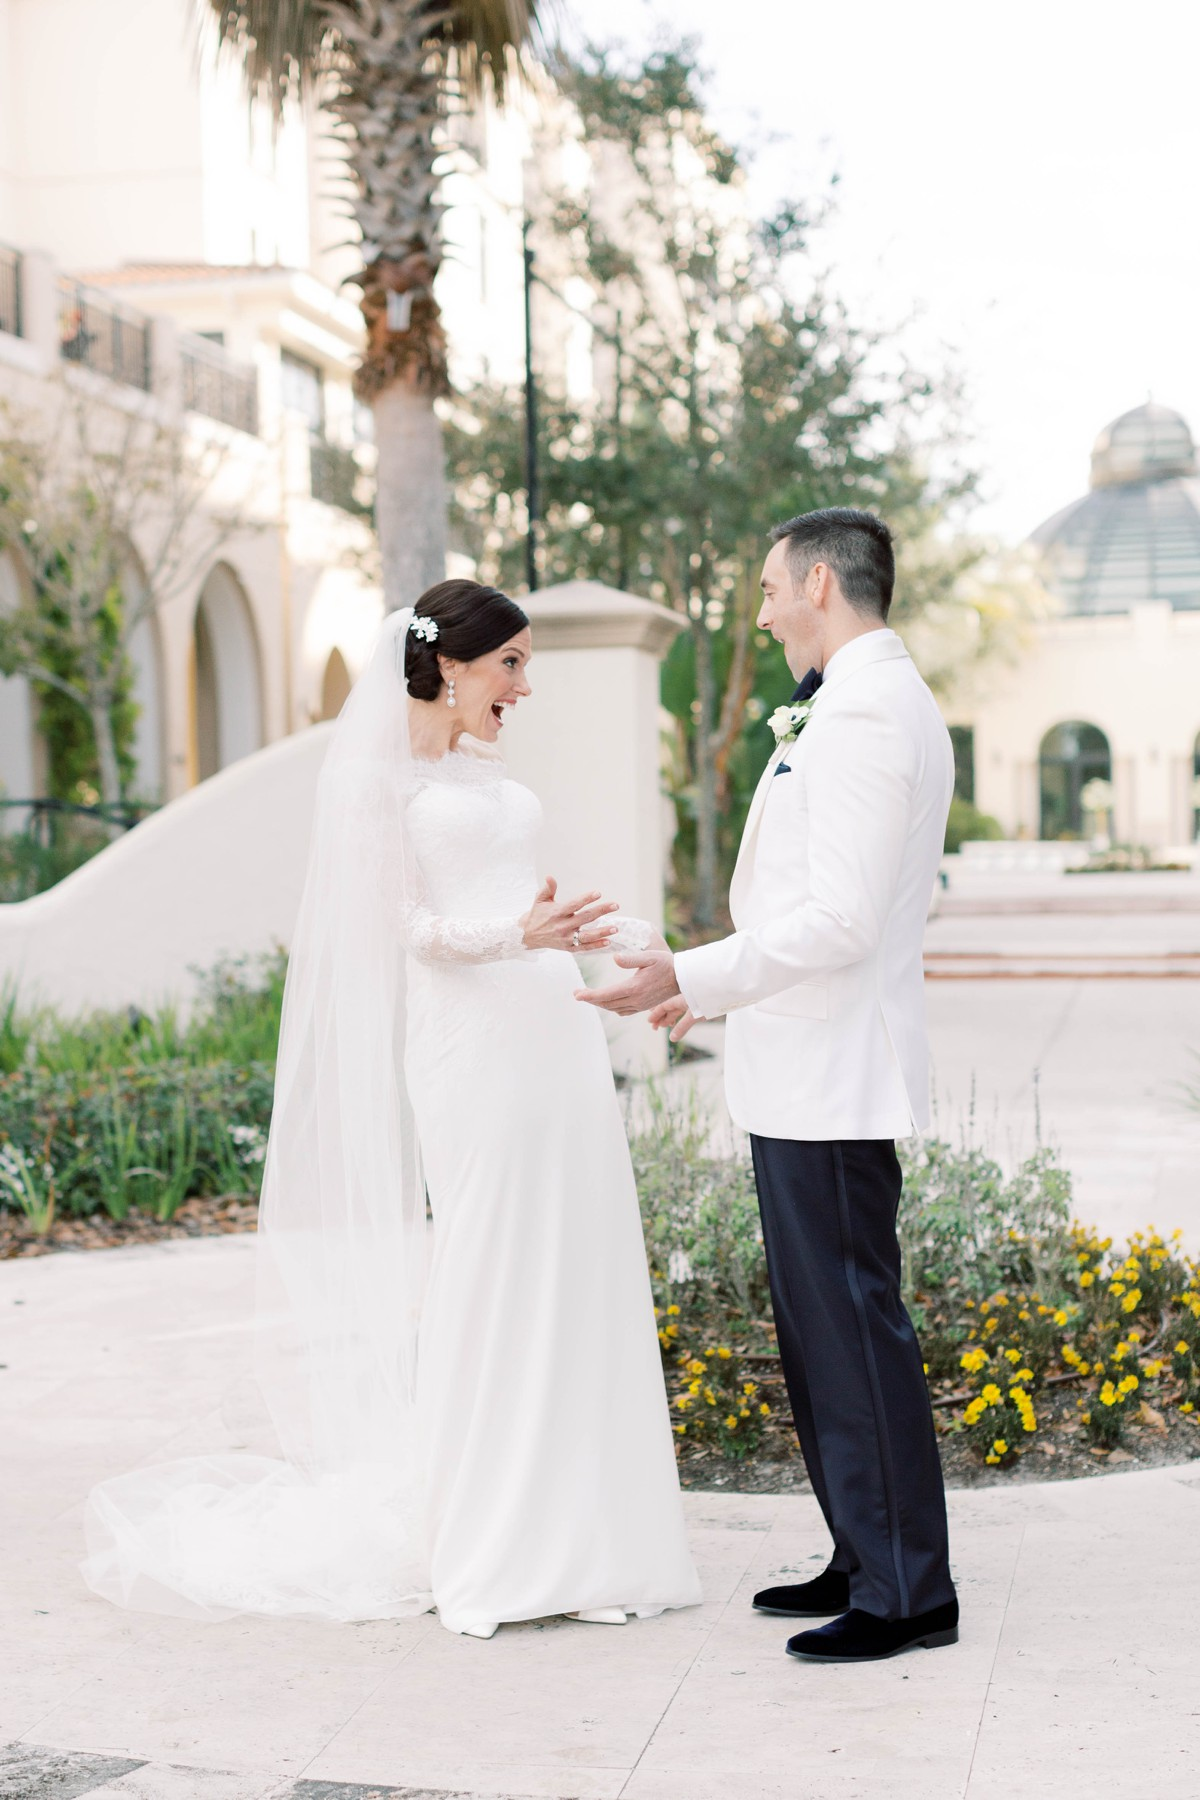 Alfond-Inn-Wedding-Winter-Park-Wedding-Photographer-Chantell-Rae-Photography_0009.jpg